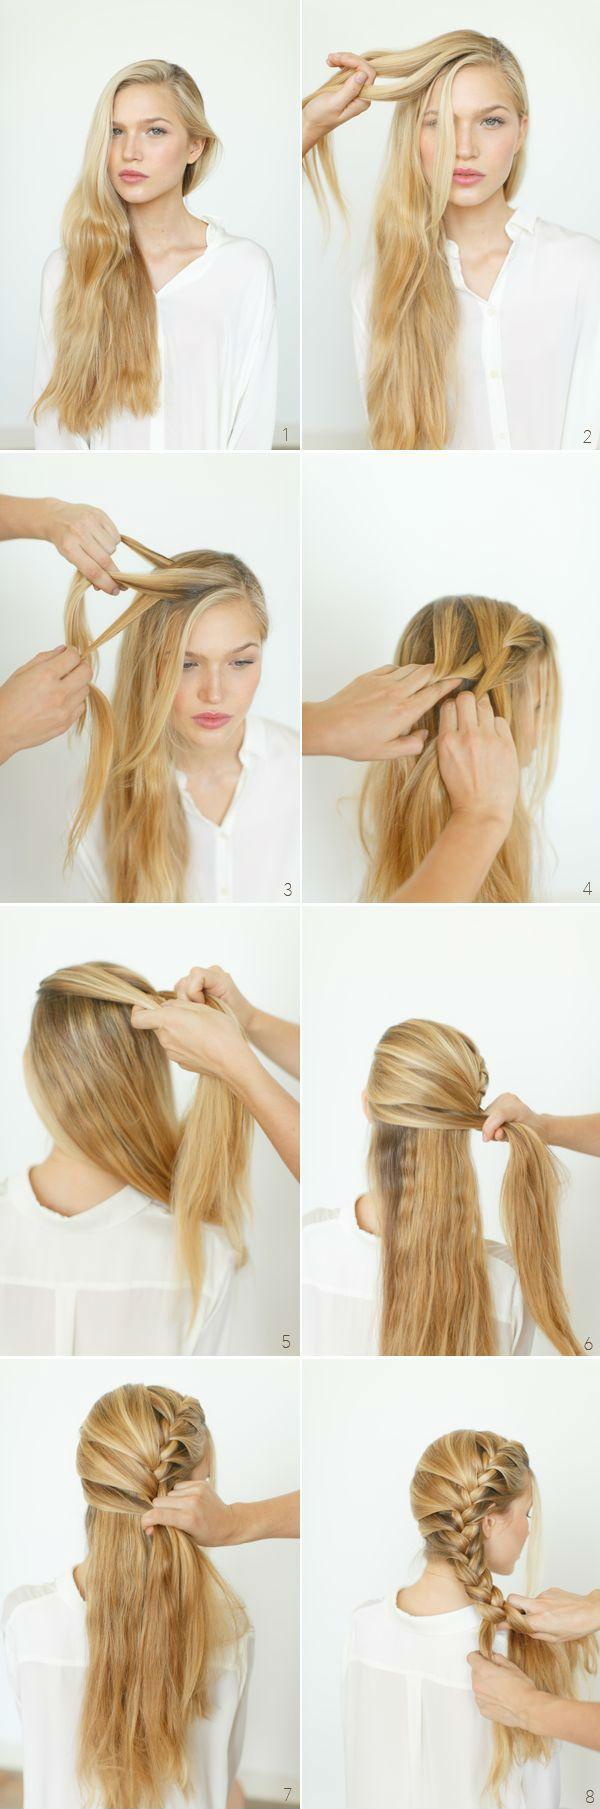 60 best roman/greek hairstyles images on pinterest | hairstyles